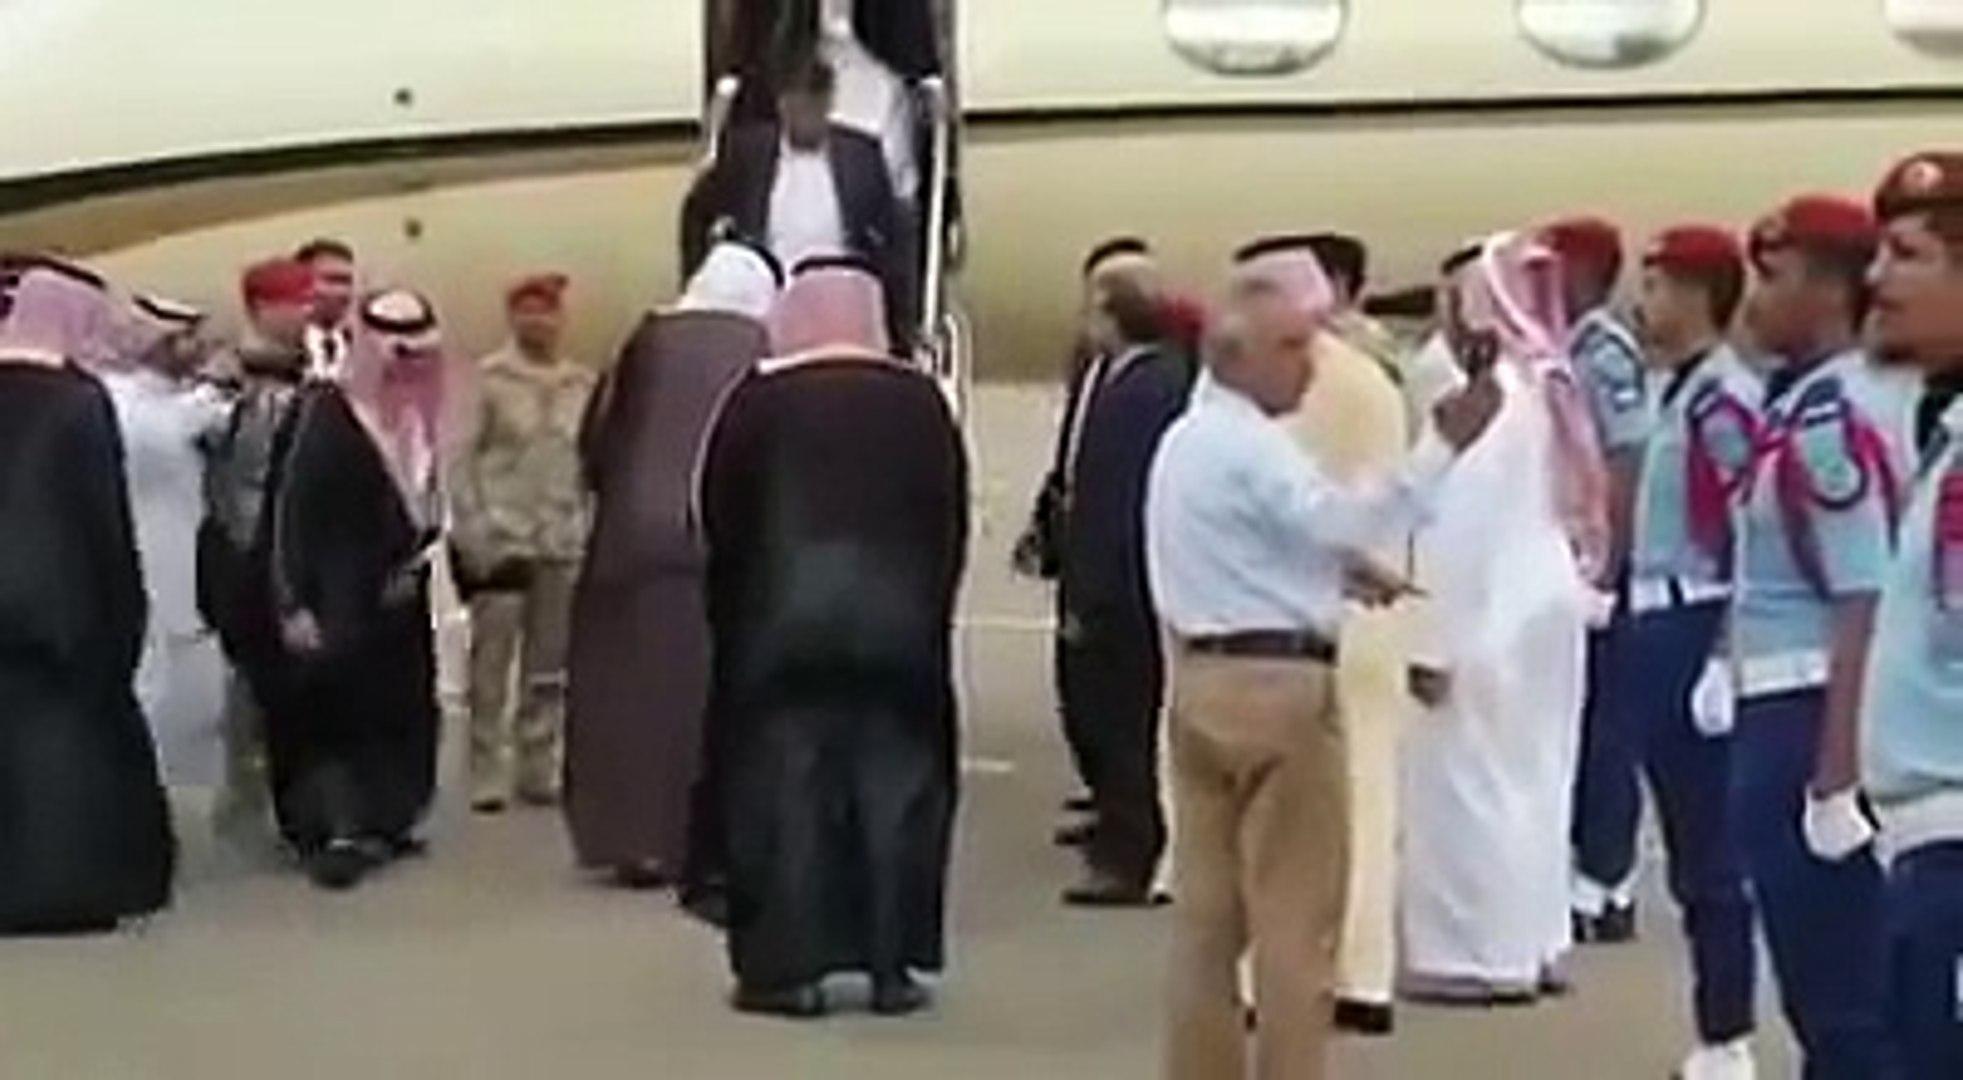 Prime Minister Imran Khan arrived in Saudi Arabia - Imran Khan Visit Saudi Arabia - Imran Khan Umrah